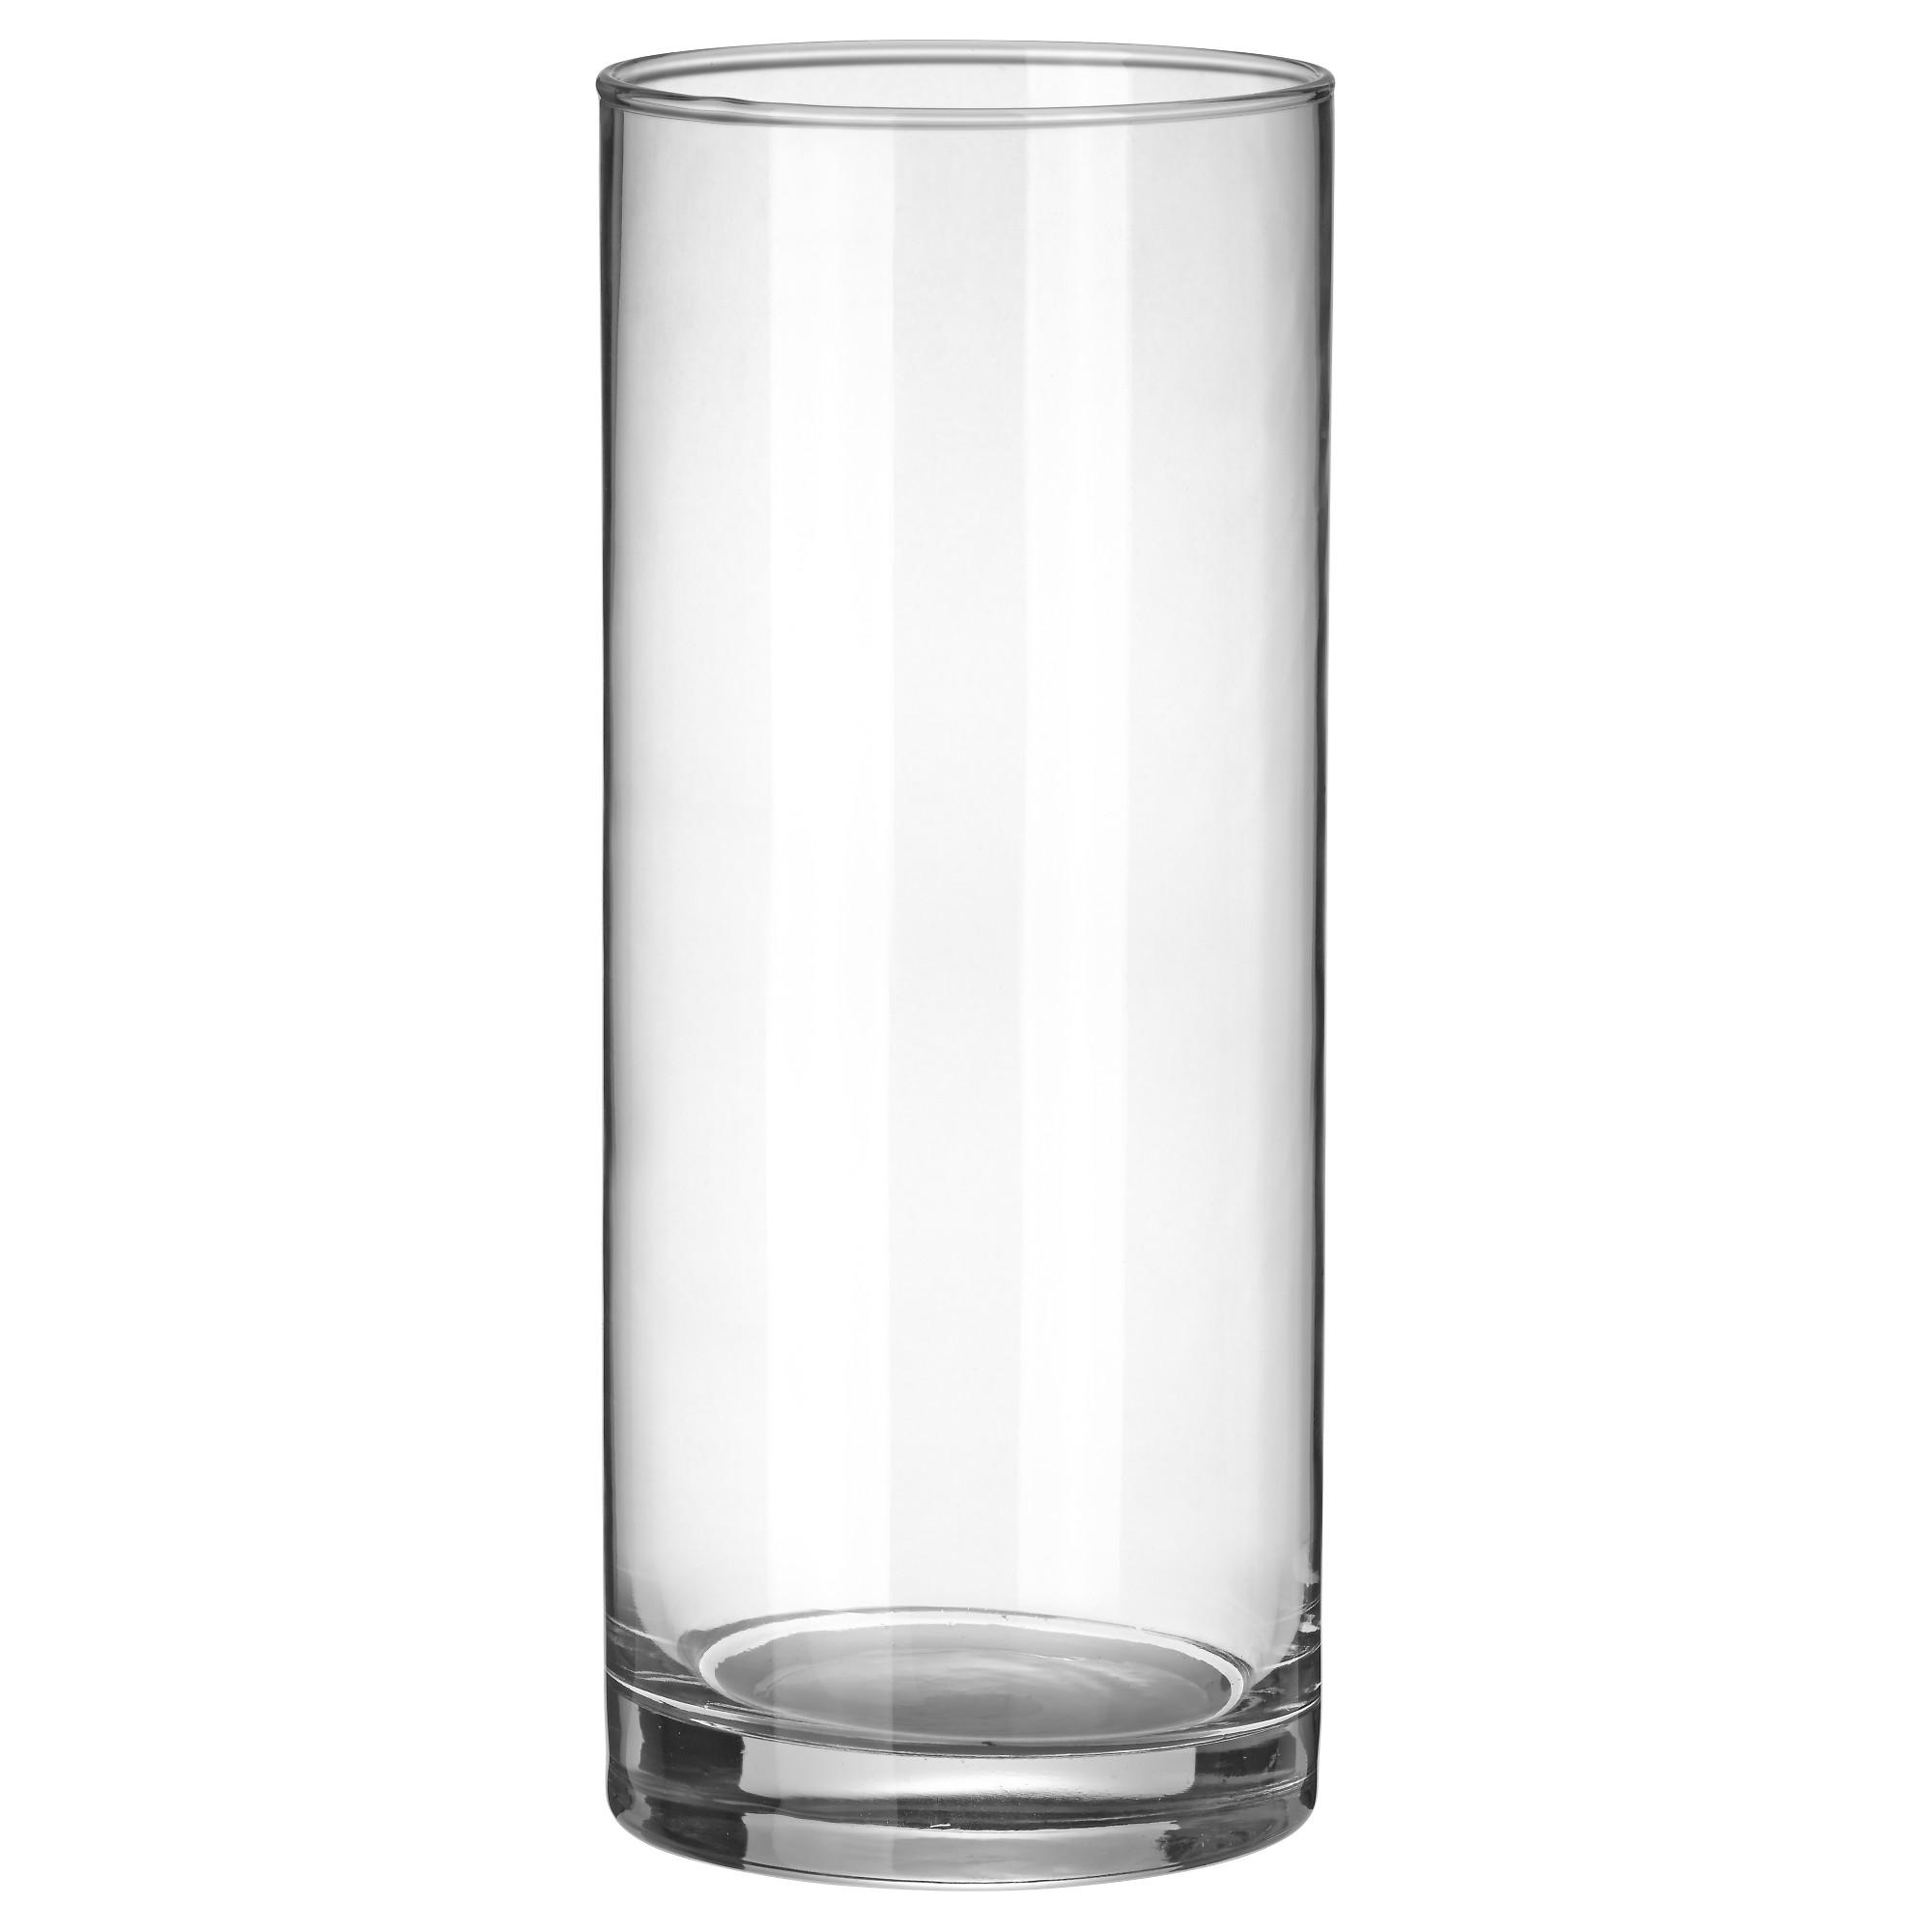 Ваза стеклянная цилиндр прозрачная высокая без узора